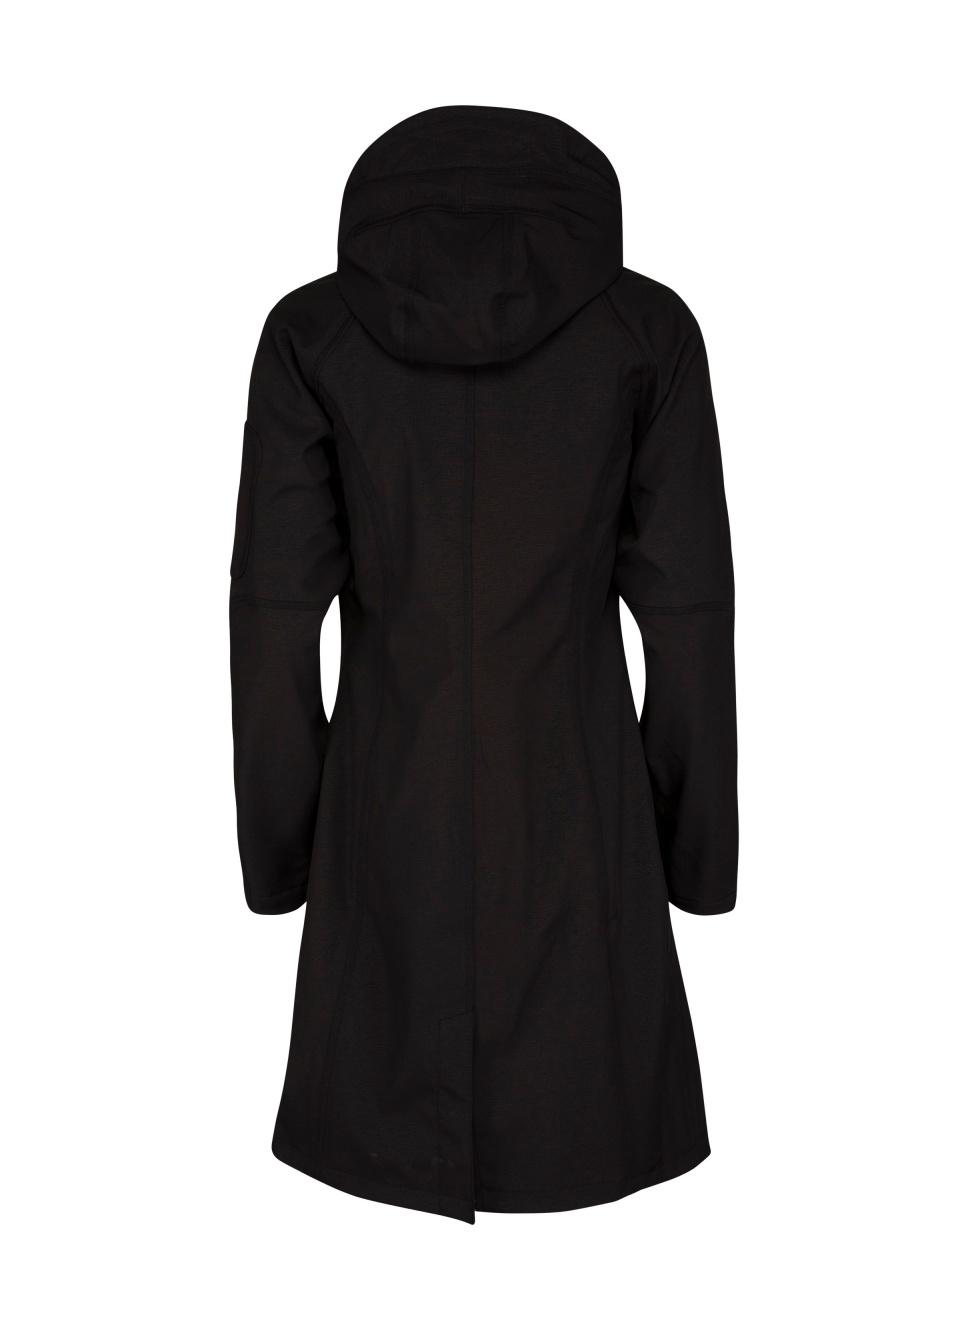 7945675f111a Ilse Jacobsen Rain37L Long Soft Shell Raincoat | Walk The Storm